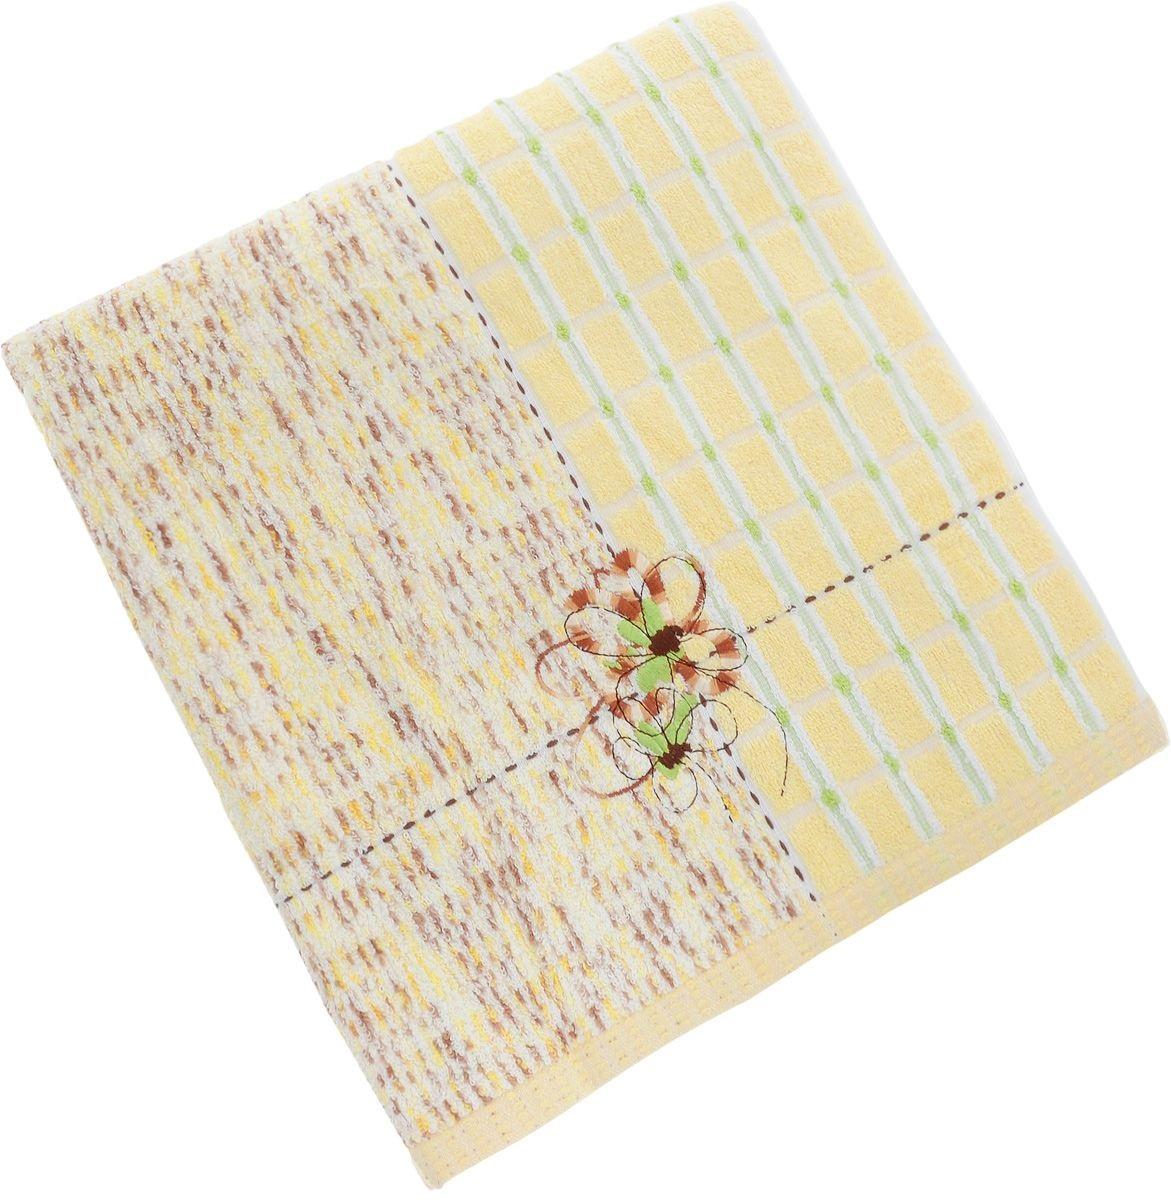 Полотенца Soavita Полотенце Sandra Цвет: Желтый (70х140 см) полотенца soavita полотенце sandra цвет оранжевый 50х90 см